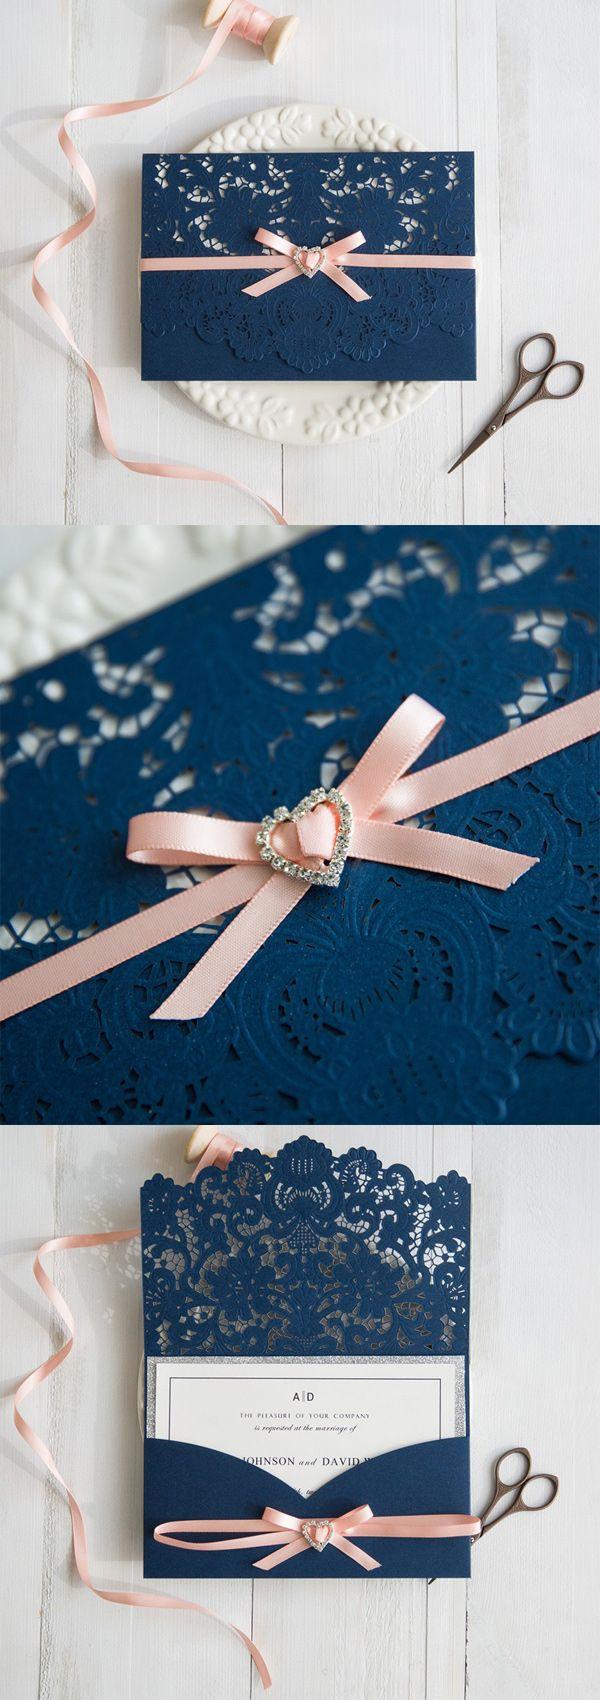 best wedding cards images on pinterest card wedding invitation